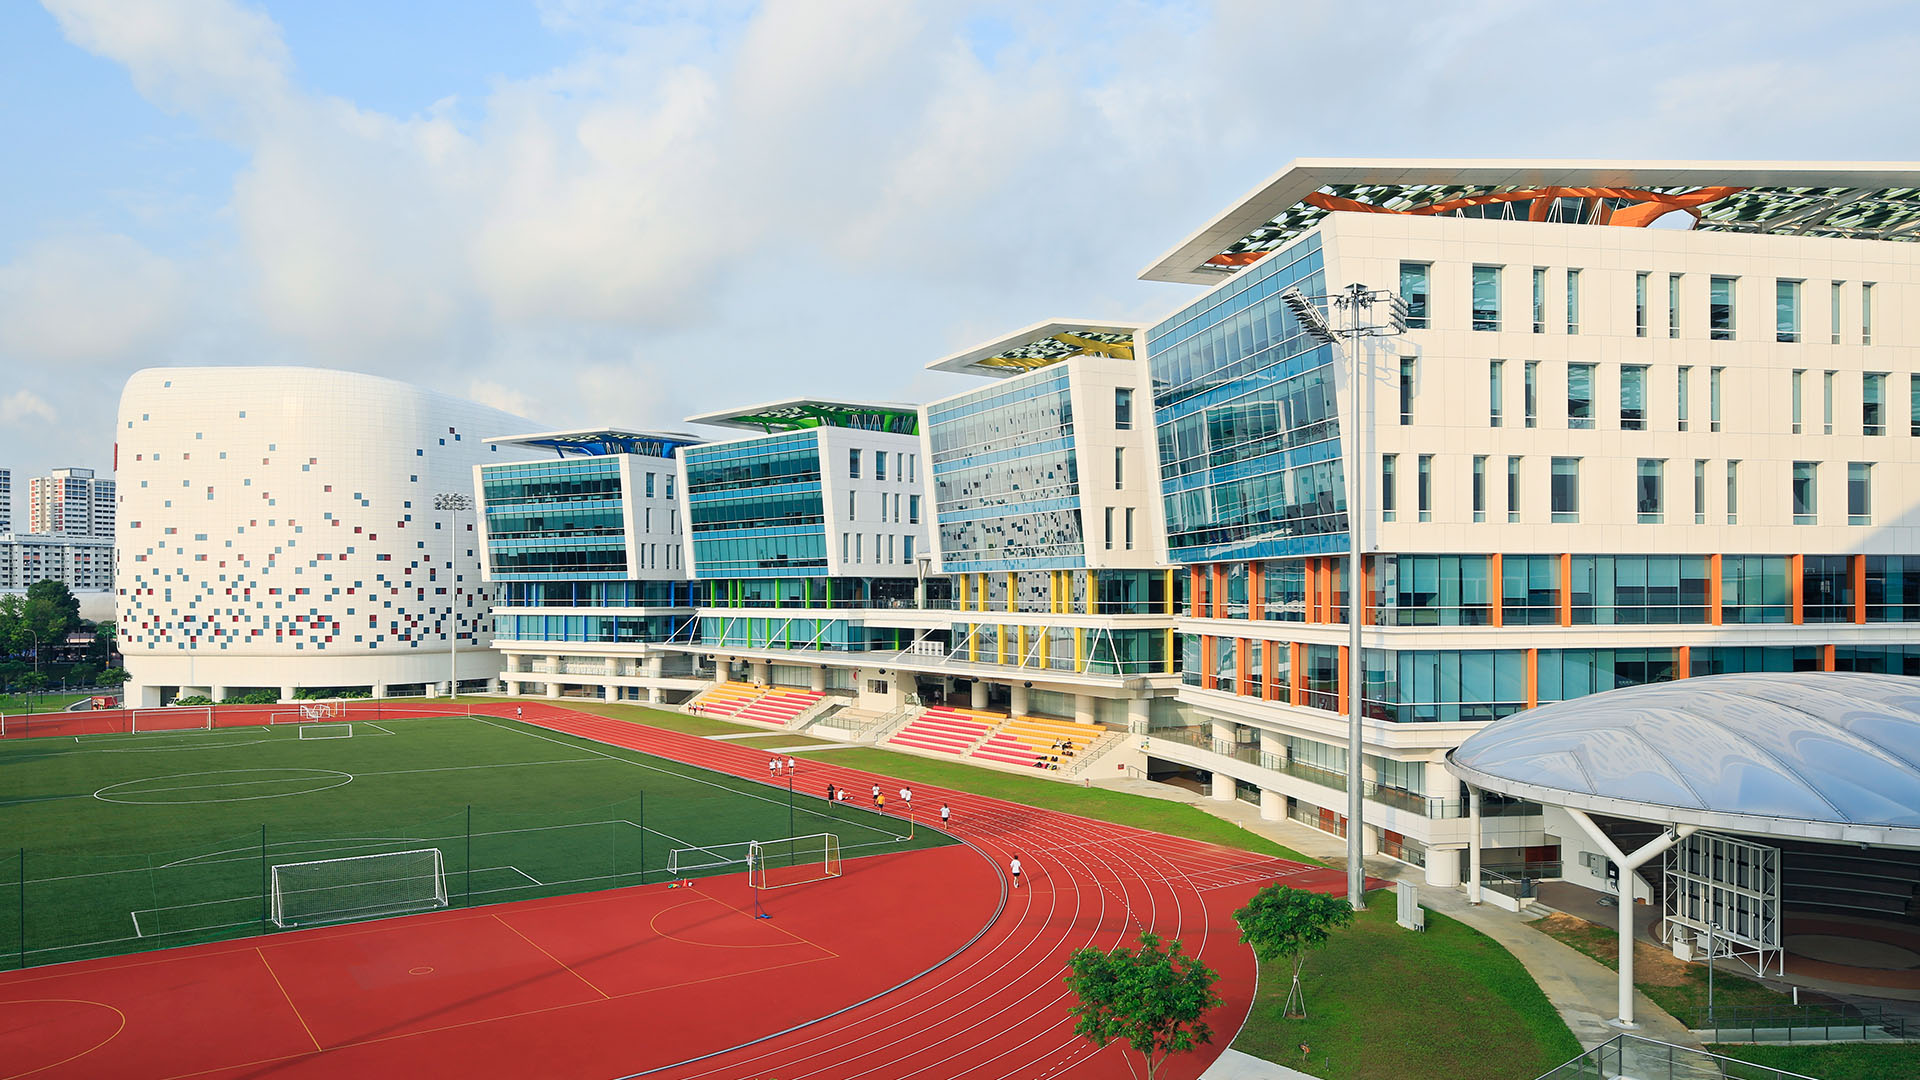 Ite College Central S School Of Design Media